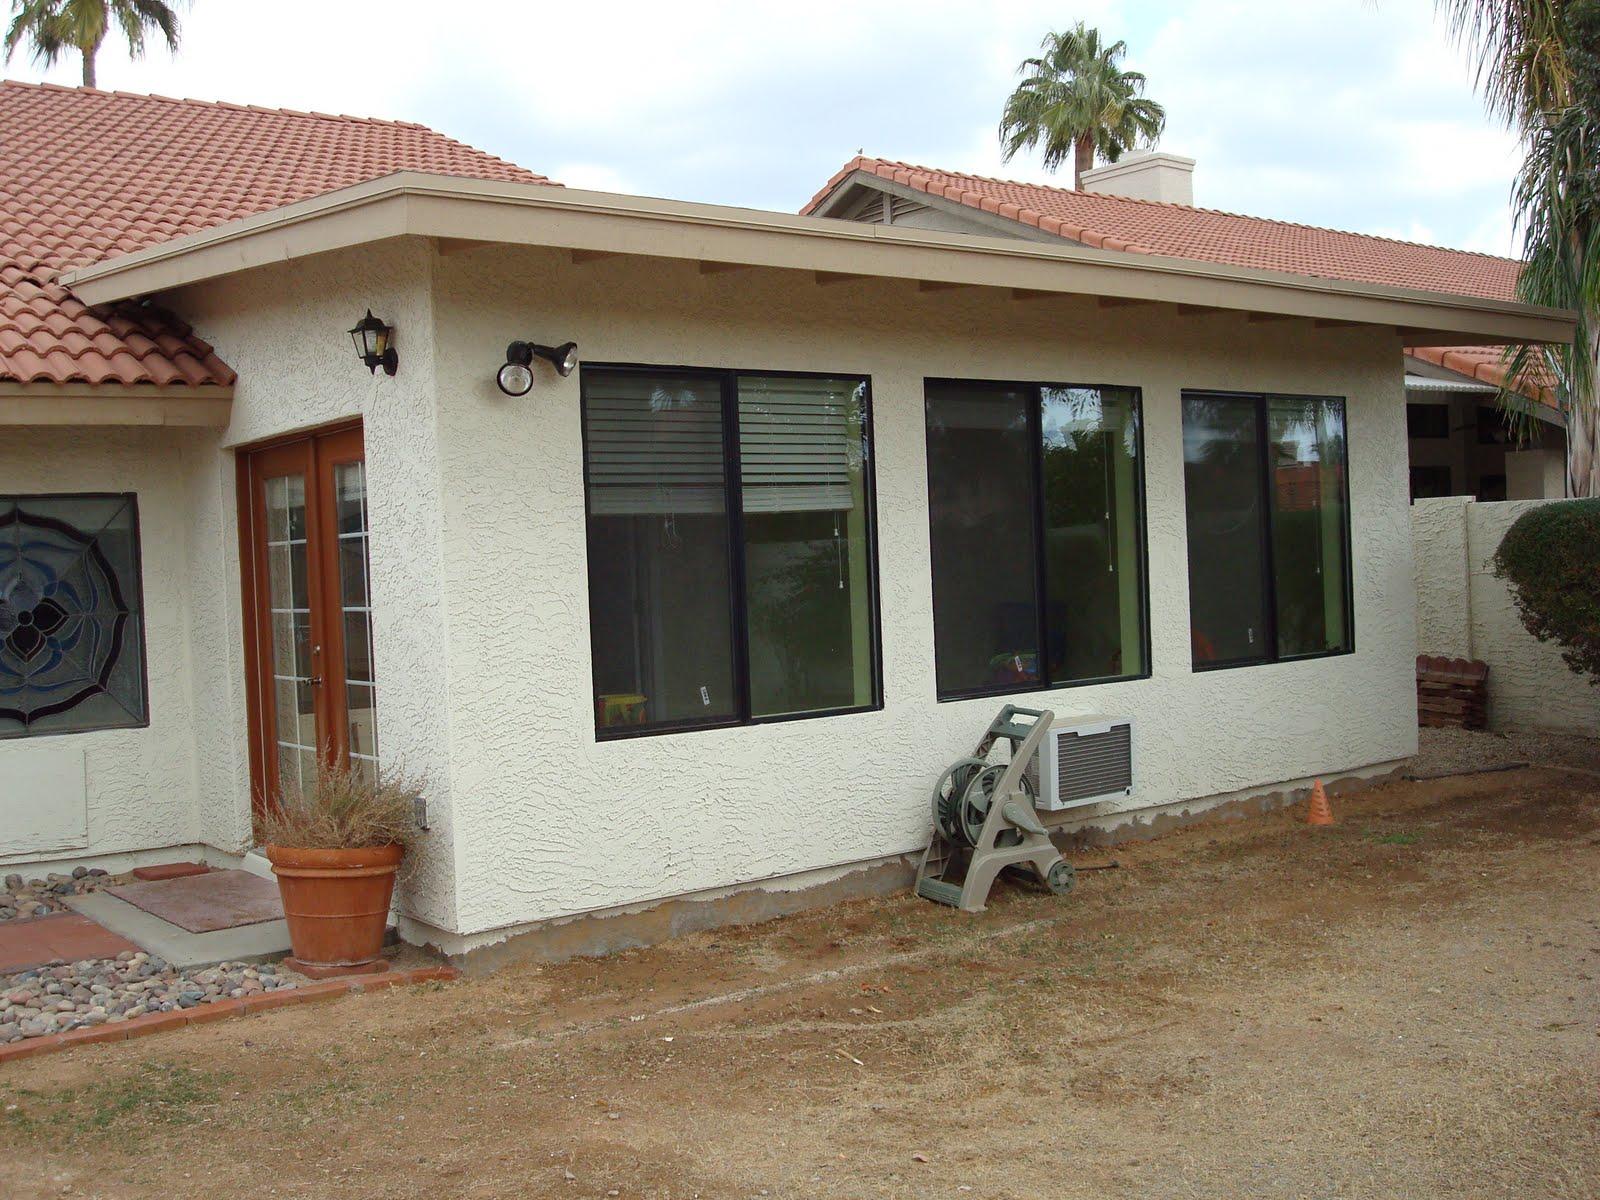 AZ Enclosures and Sunrooms 602 791 3228 Arizona Room Addition Contractor